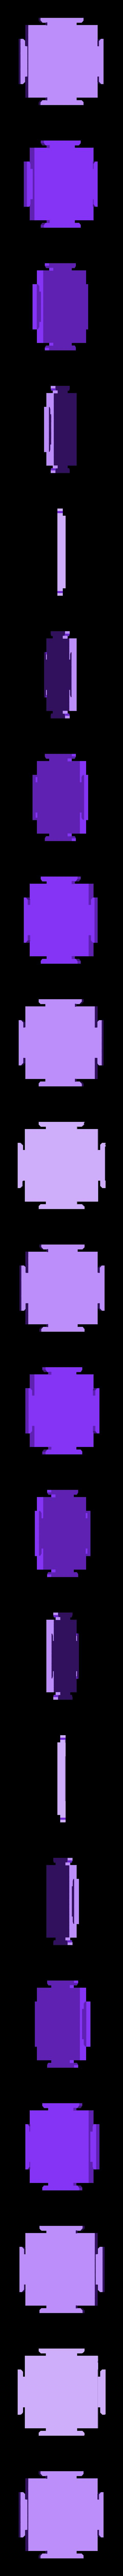 T2.STL Download free STL file Chess set / Chess set • 3D printable model, OC3D